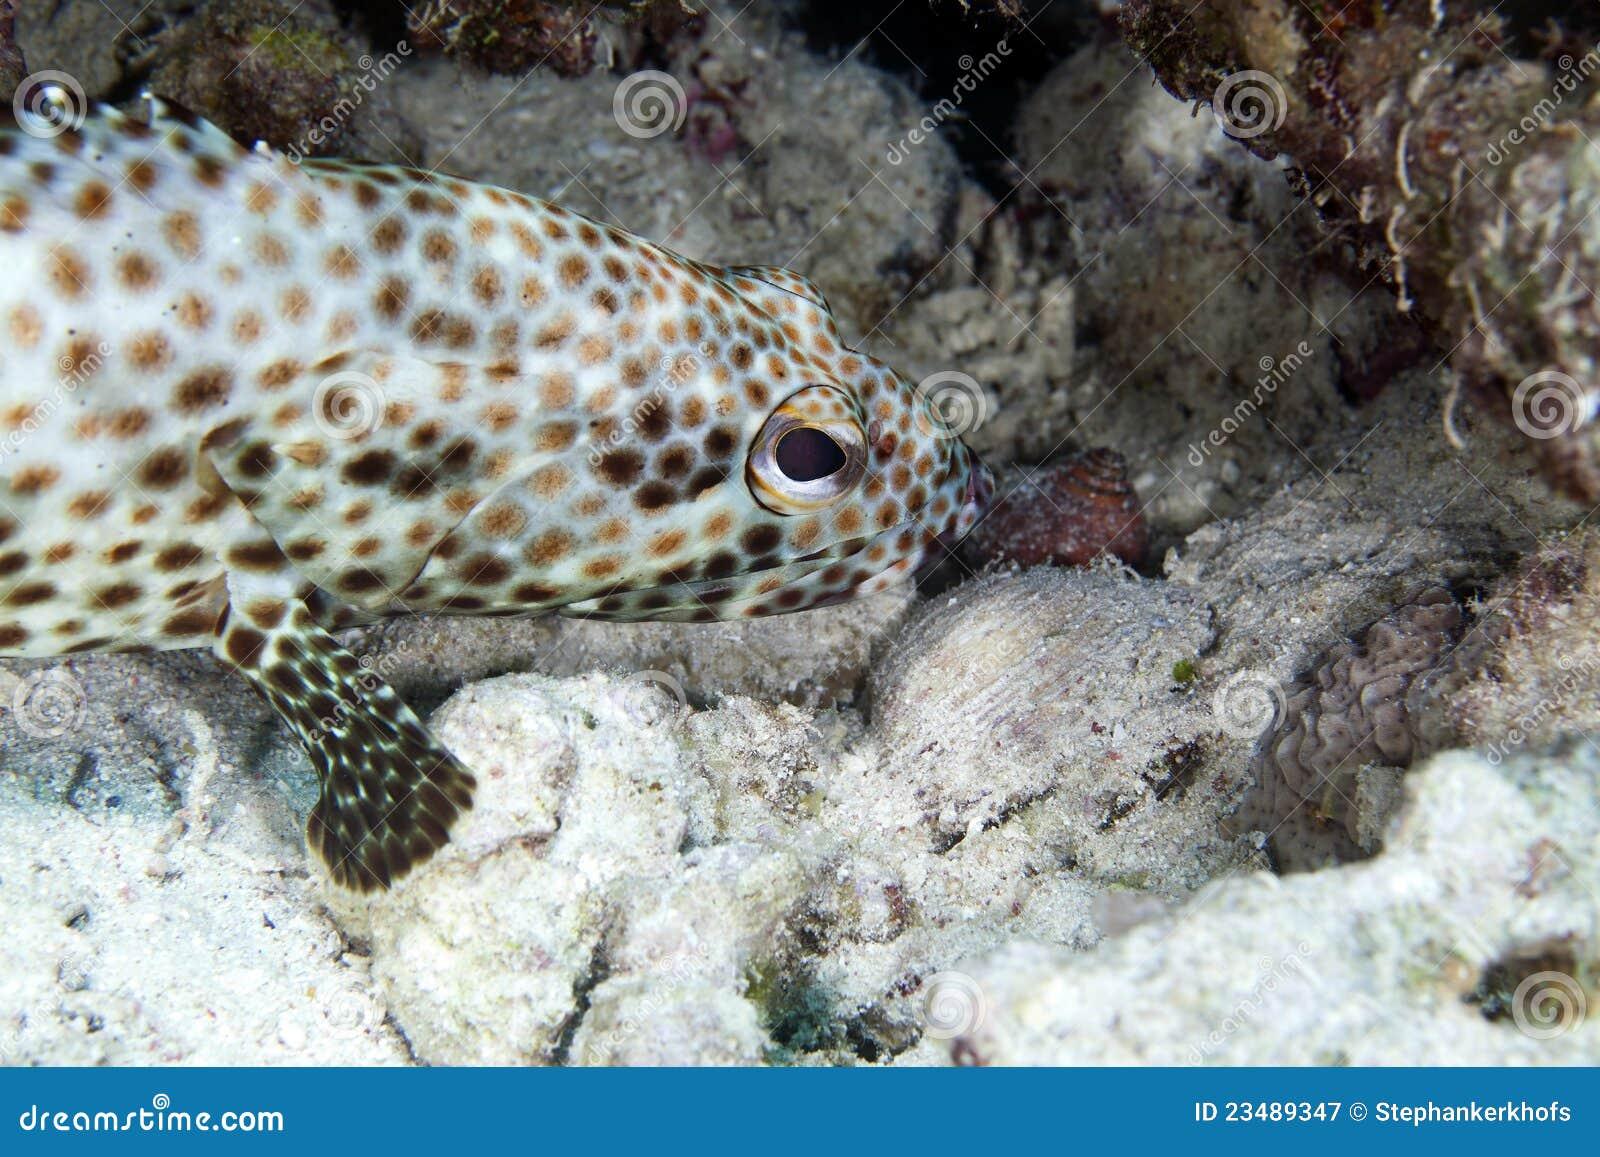 Greasy grouper (ephinephelus tauvina) in the Red Sea.